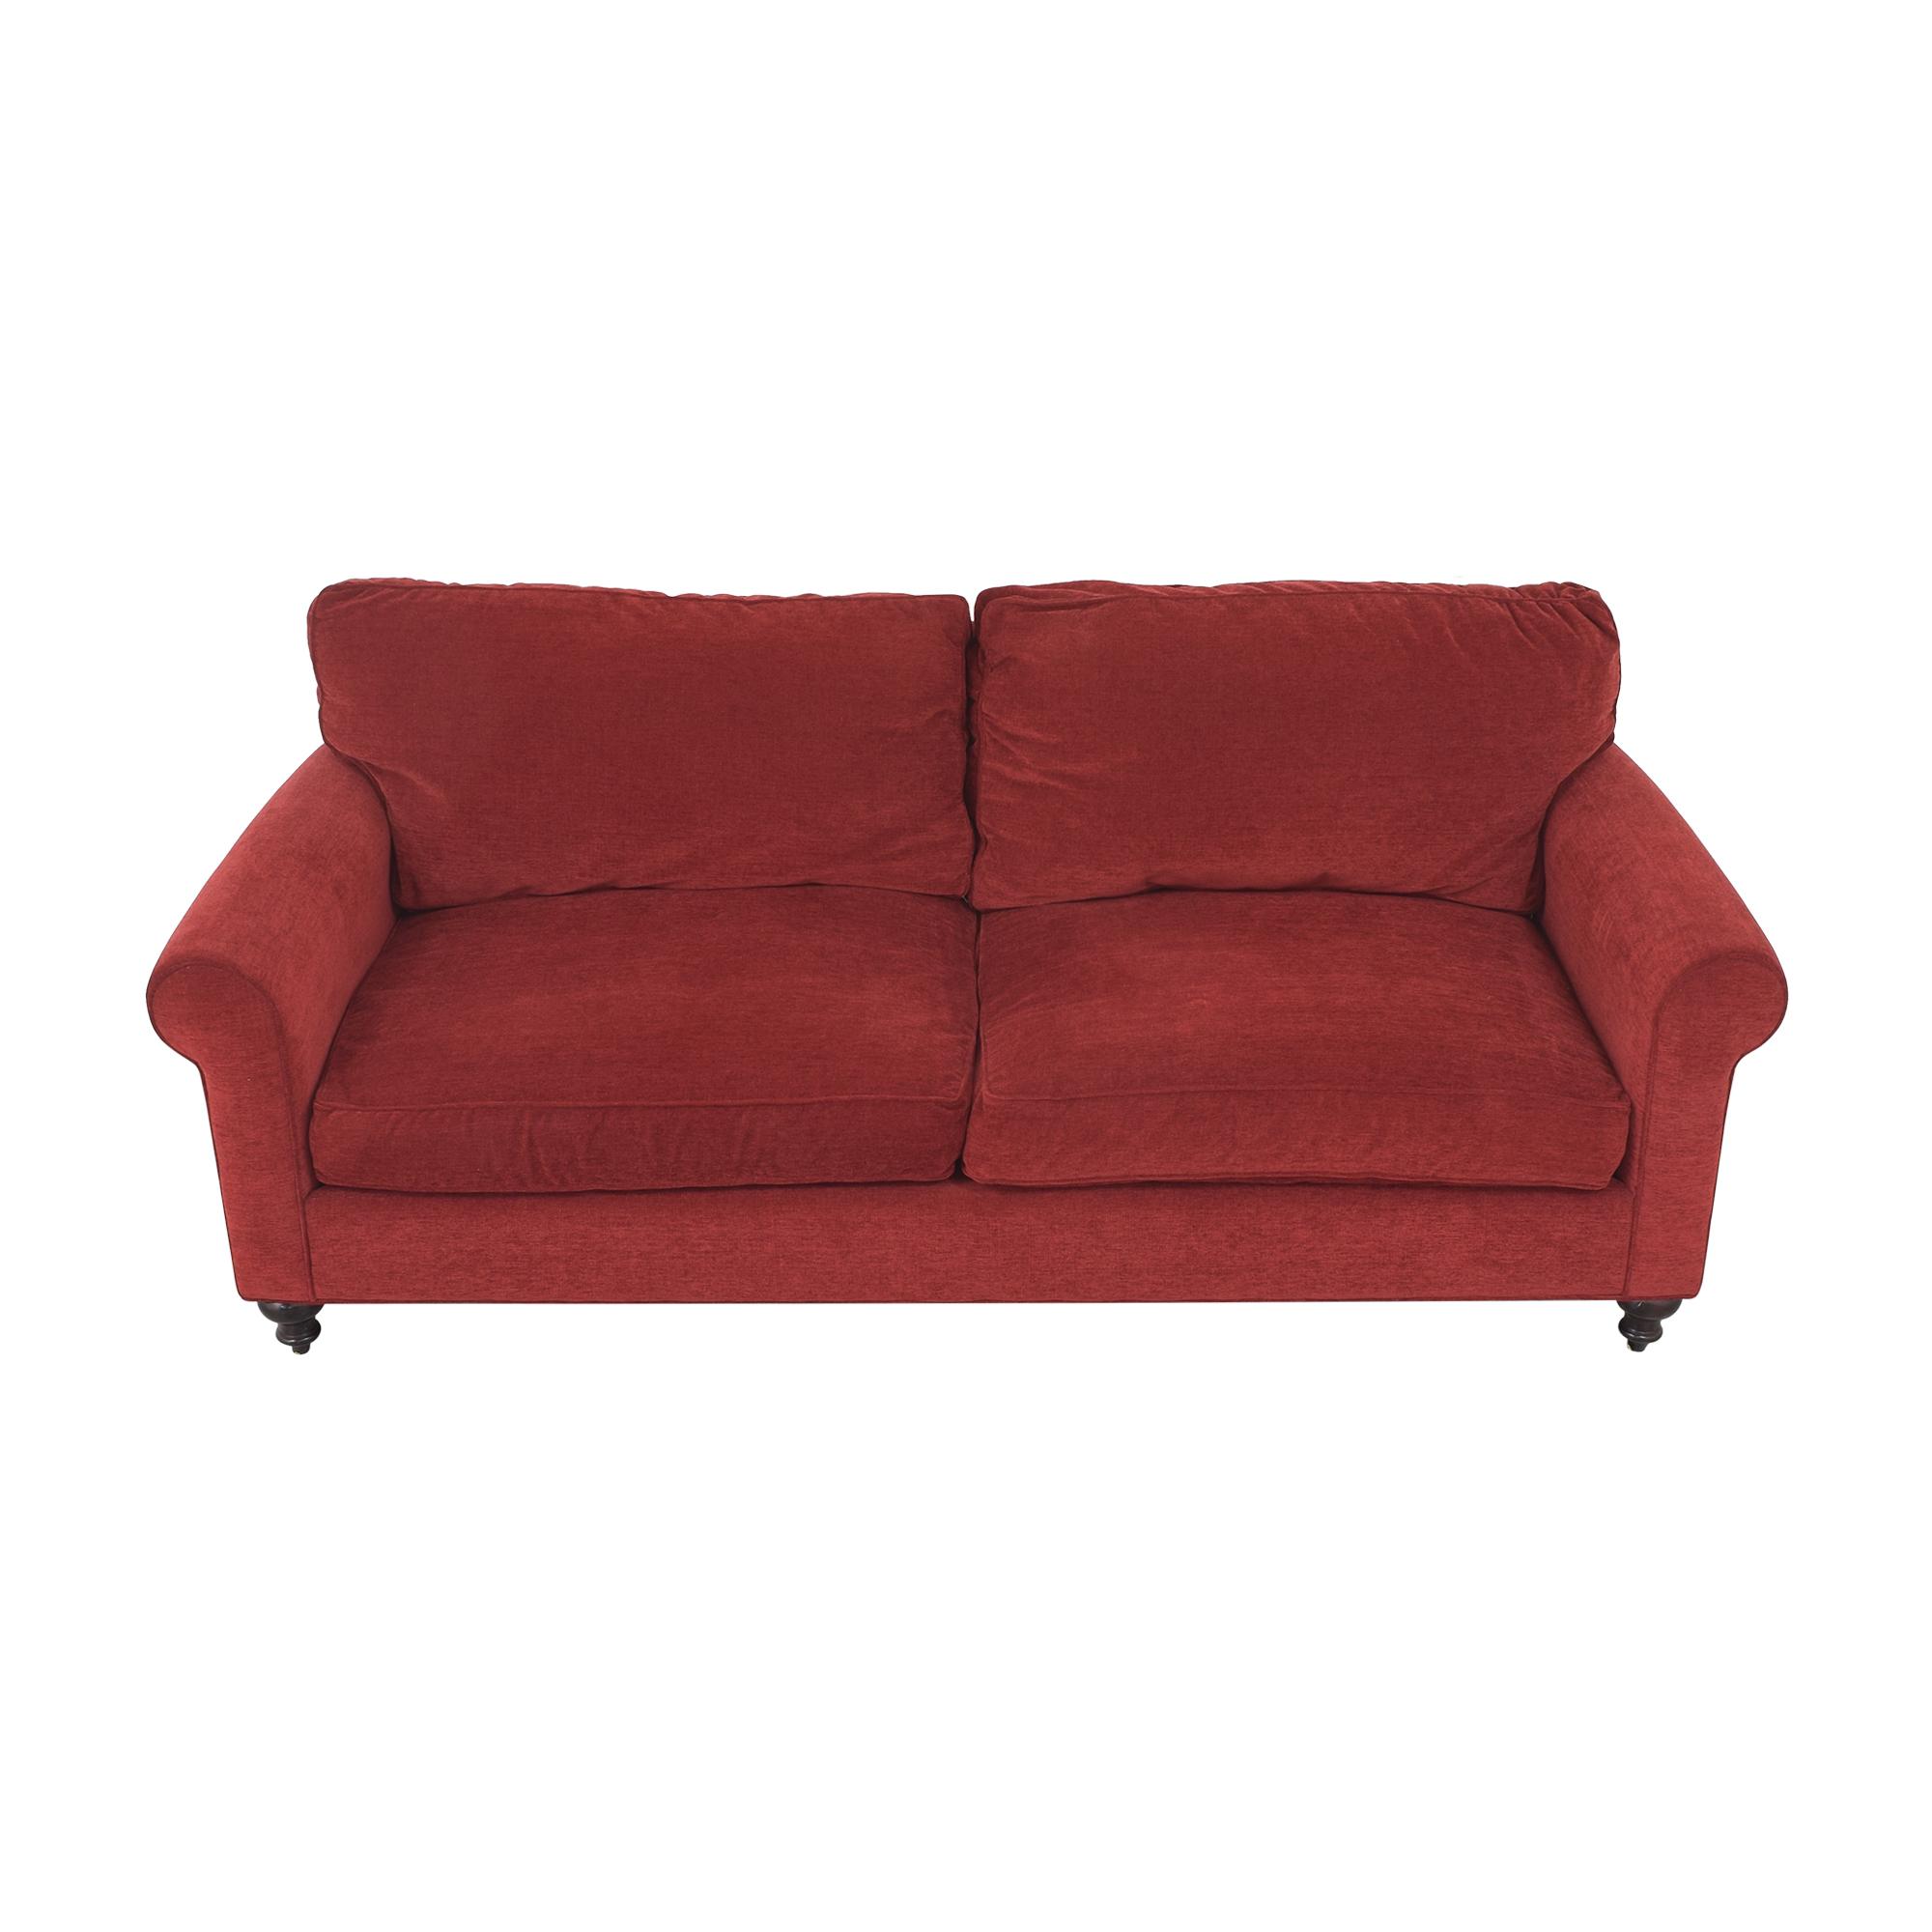 Lillian August Lillian August Roll Arm Sofa for sale